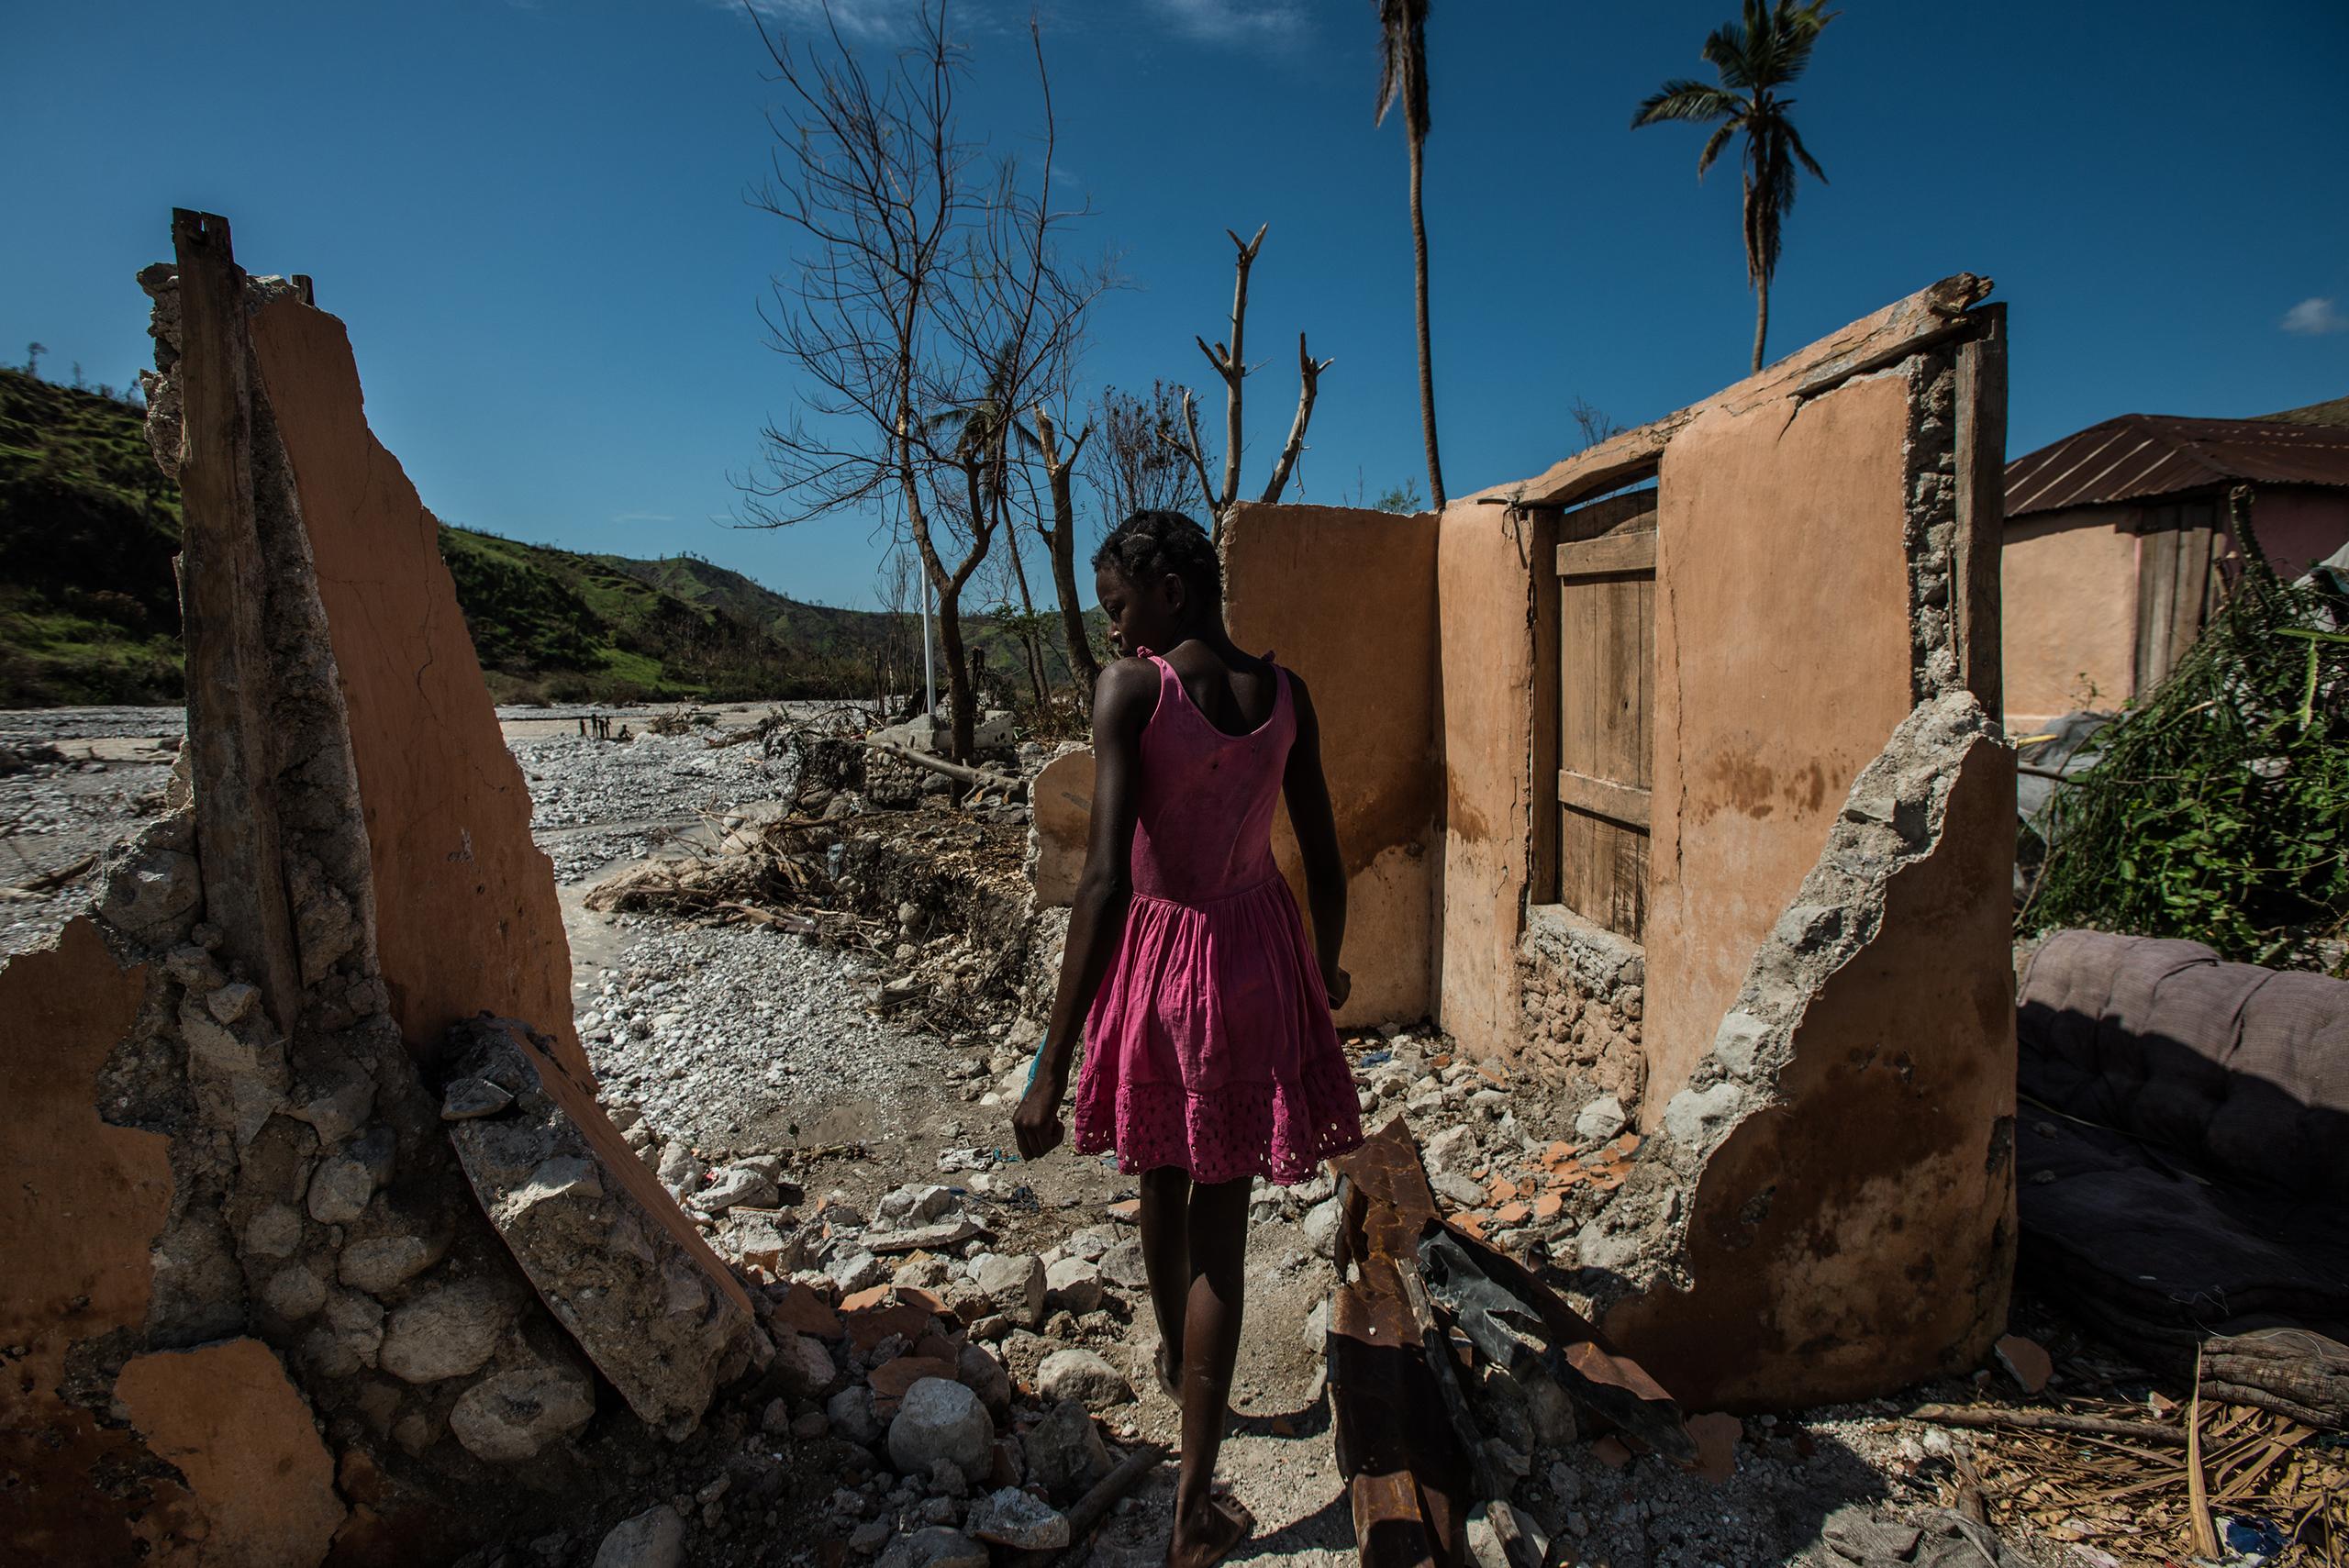 A girl walks through destroyed homes in Rendel, a village in Haiti devastated by Hurricane Matthew, on Oct. 12, 2016.